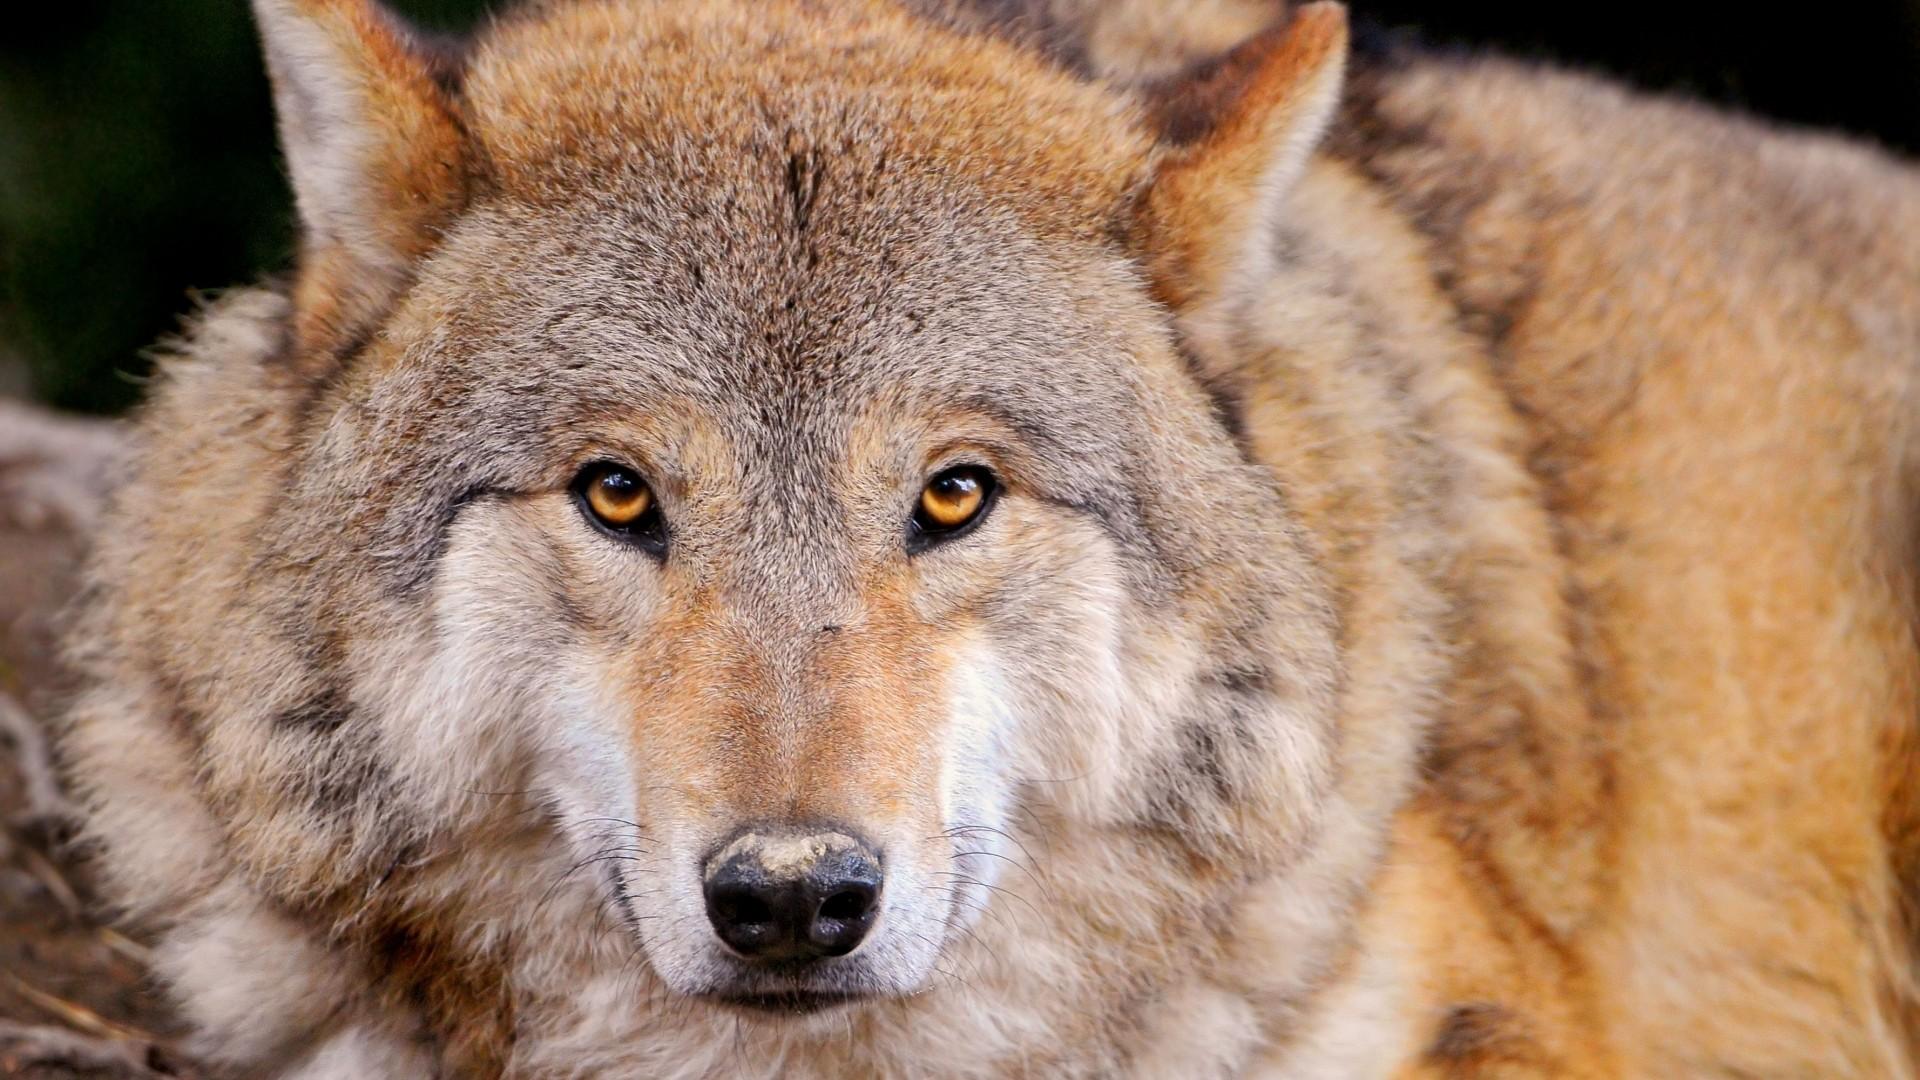 … Background Full HD 1080p. Wallpaper wolf, predator, lie,  muzzle, family dog